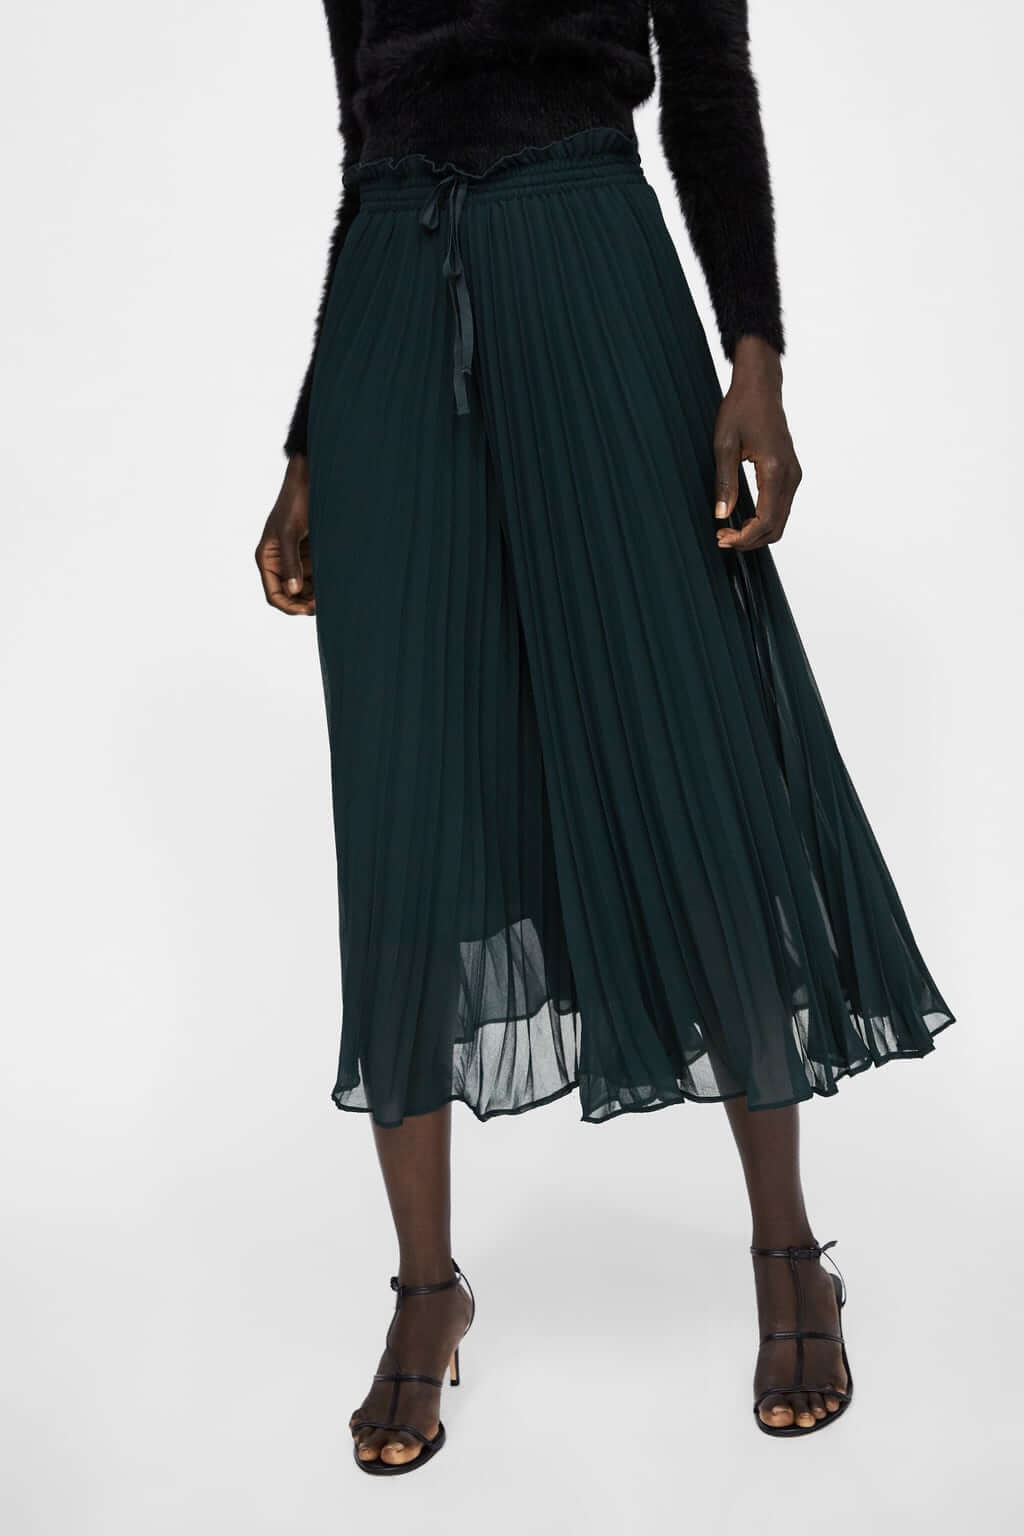 Pantalones plisados de tela vaporosa, verde oscuro.